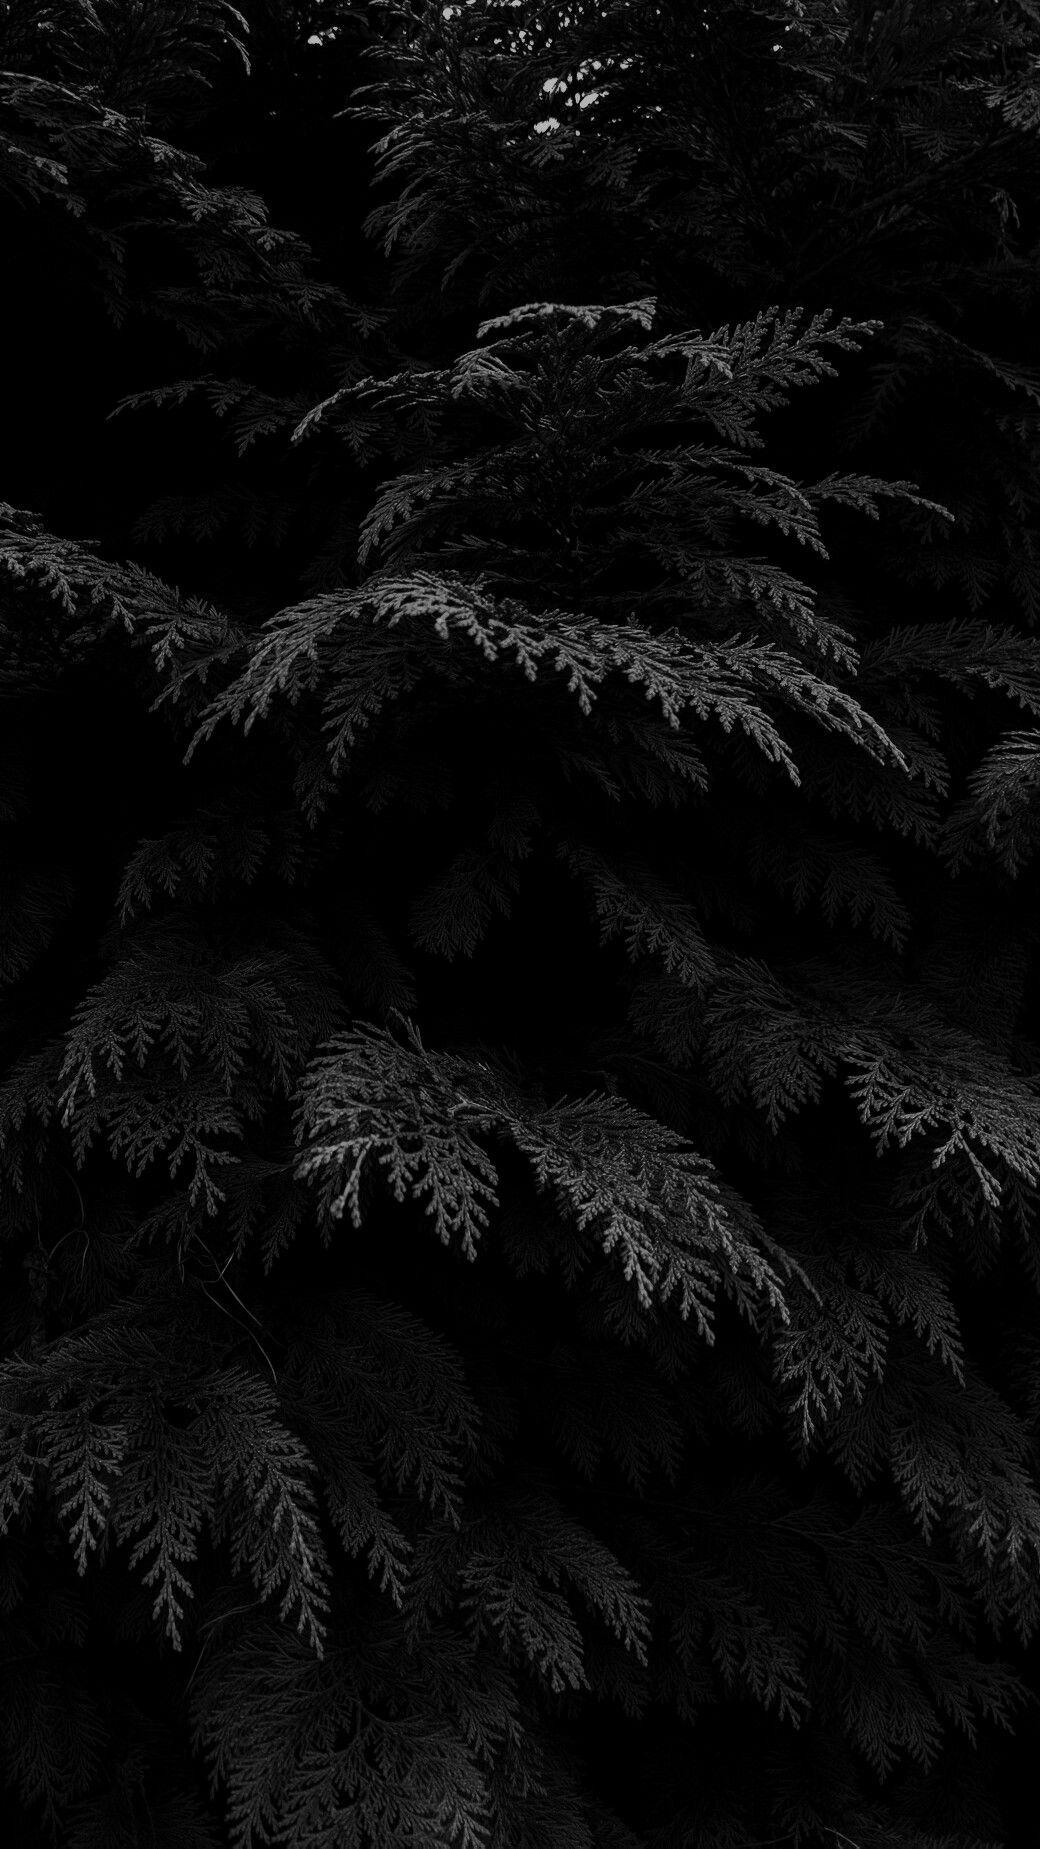 Sɴɪᴇɢᴅᴇᴊᴀ Black Colour Mood Aesthetic Dark Wallpaper Iphone Black Wallpaper Iphone Black Phone Wallpaper